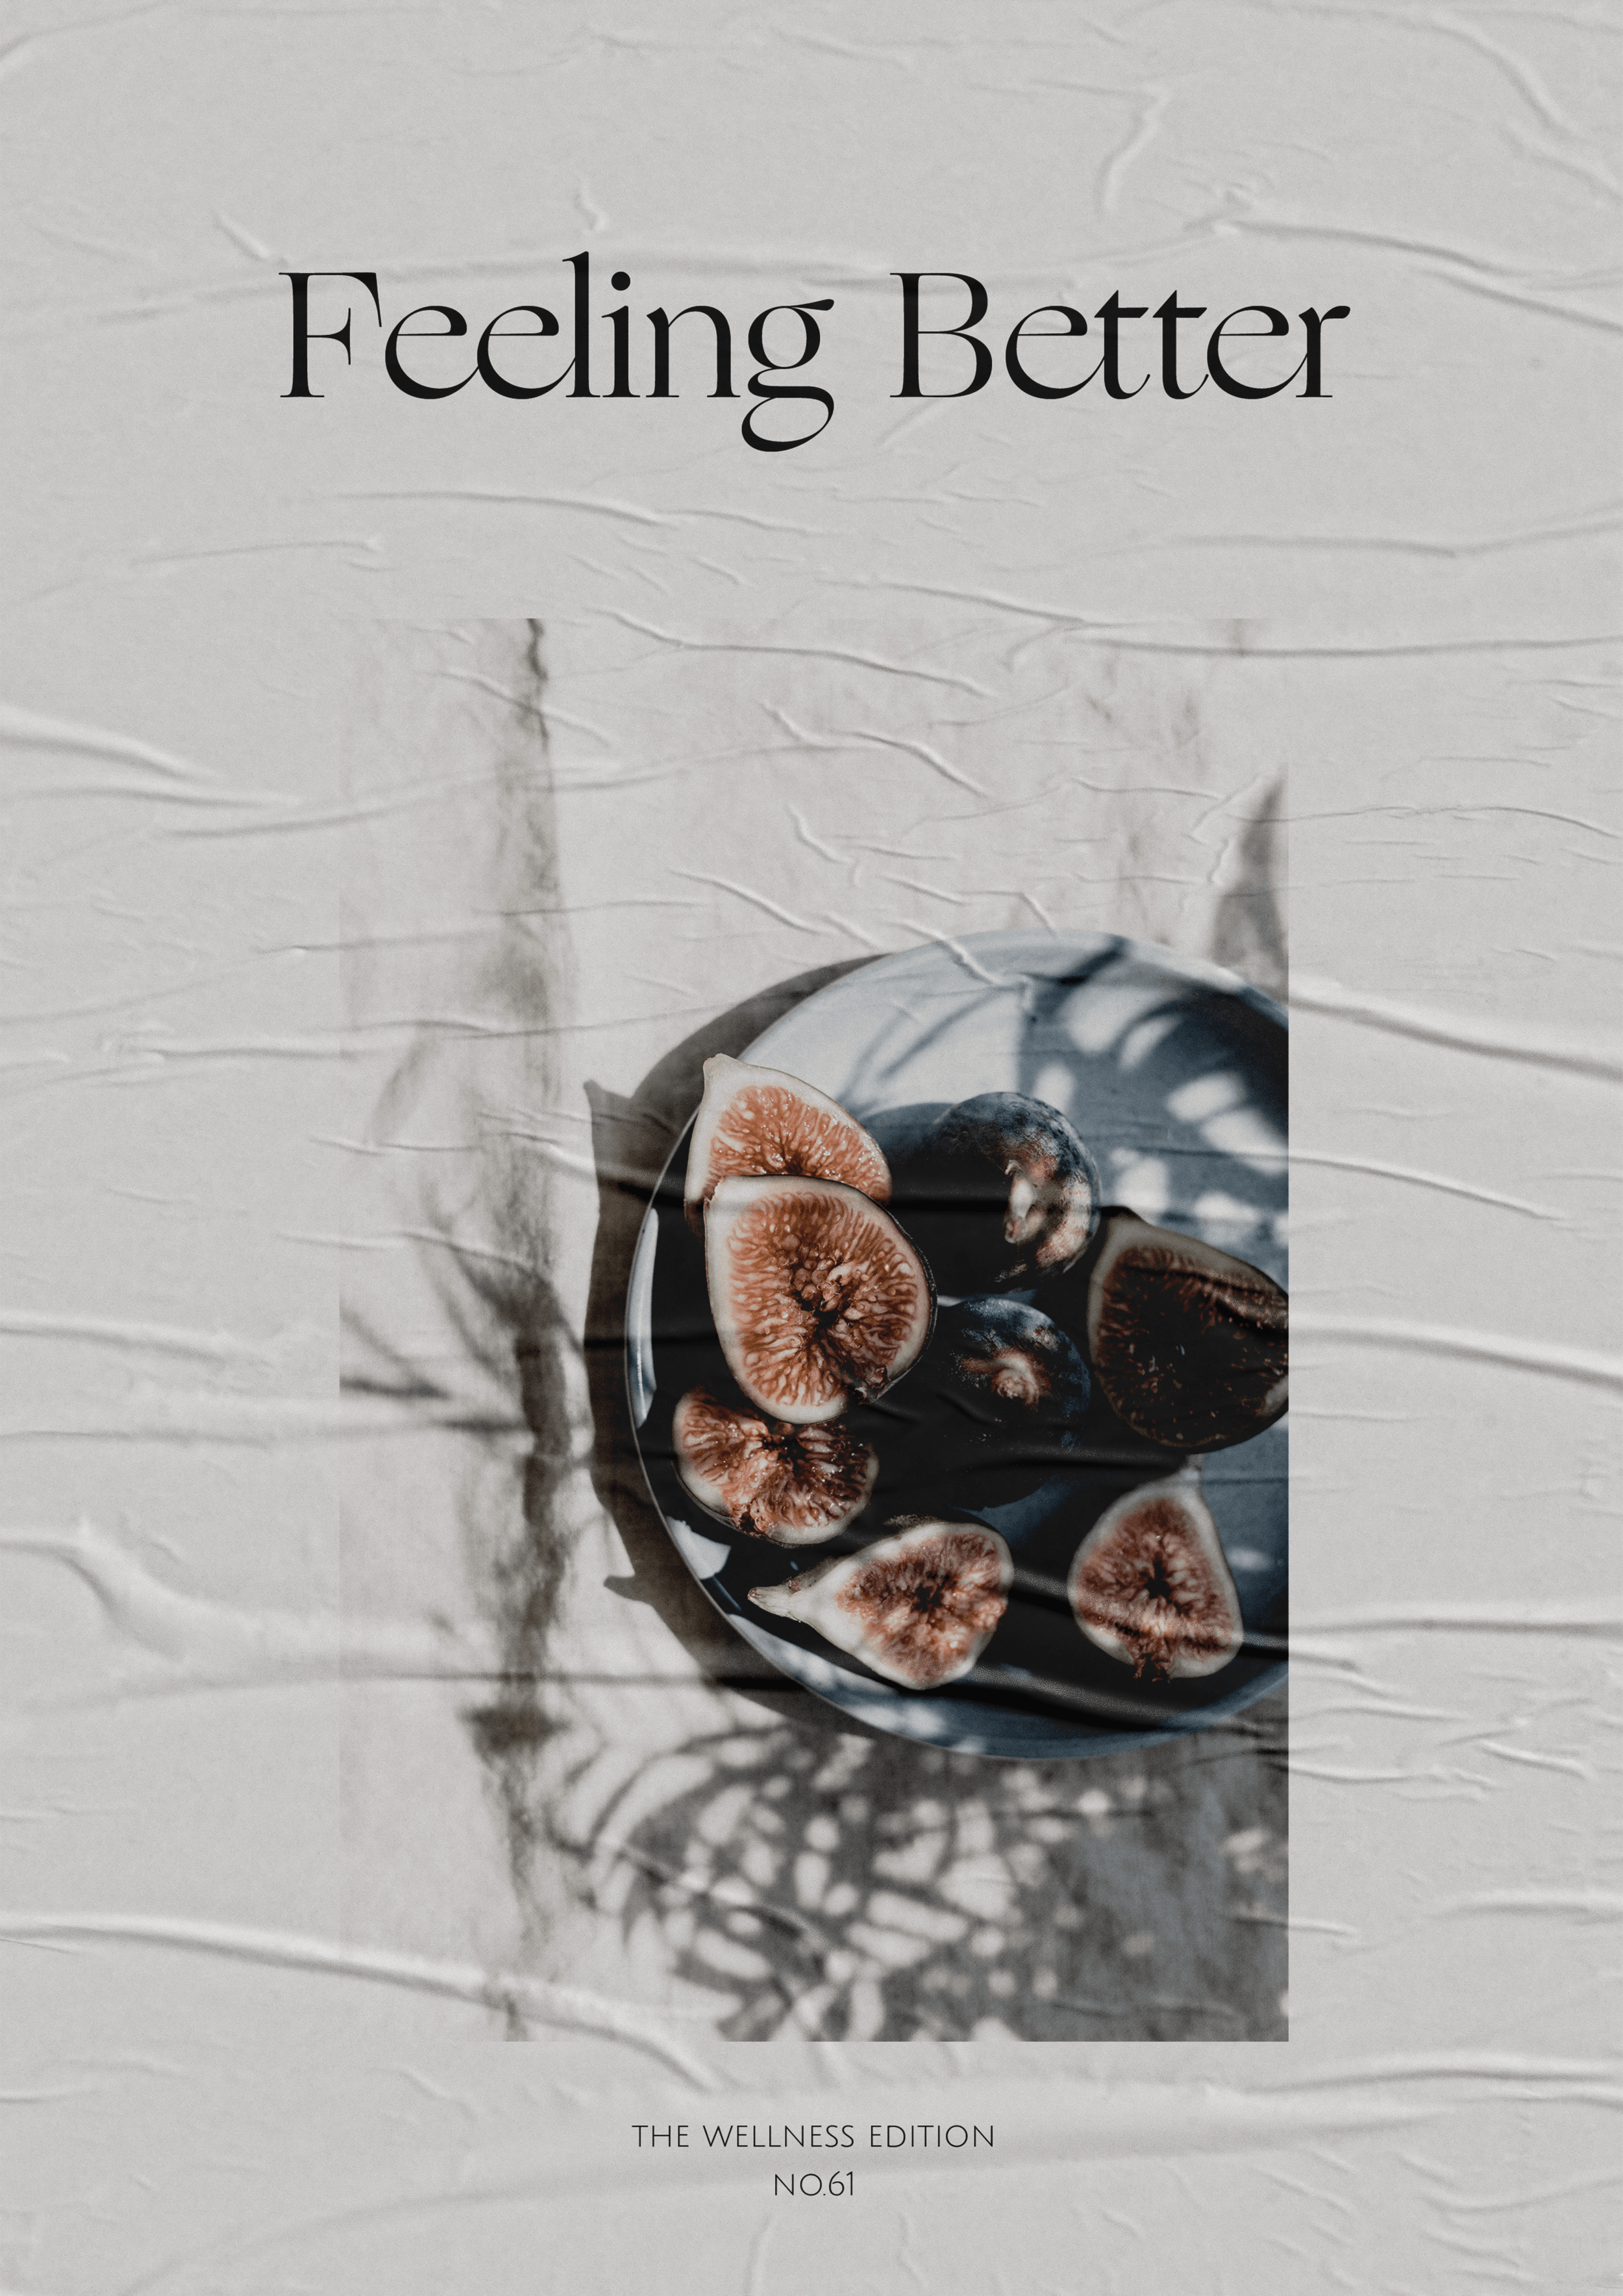 The Wellness Edition No.61 // Slowly getting better - Phylleli Design Studio, Self-Care Blog and Online-Shop #design #editorialdesign #graphicdesign #typography #mentalhealth #selflove #selfcare #goalsetting #thewellnessedition #phylleli #loveyourseflmore #minimalism #branding #layout #elegantdesign #selfcareblog